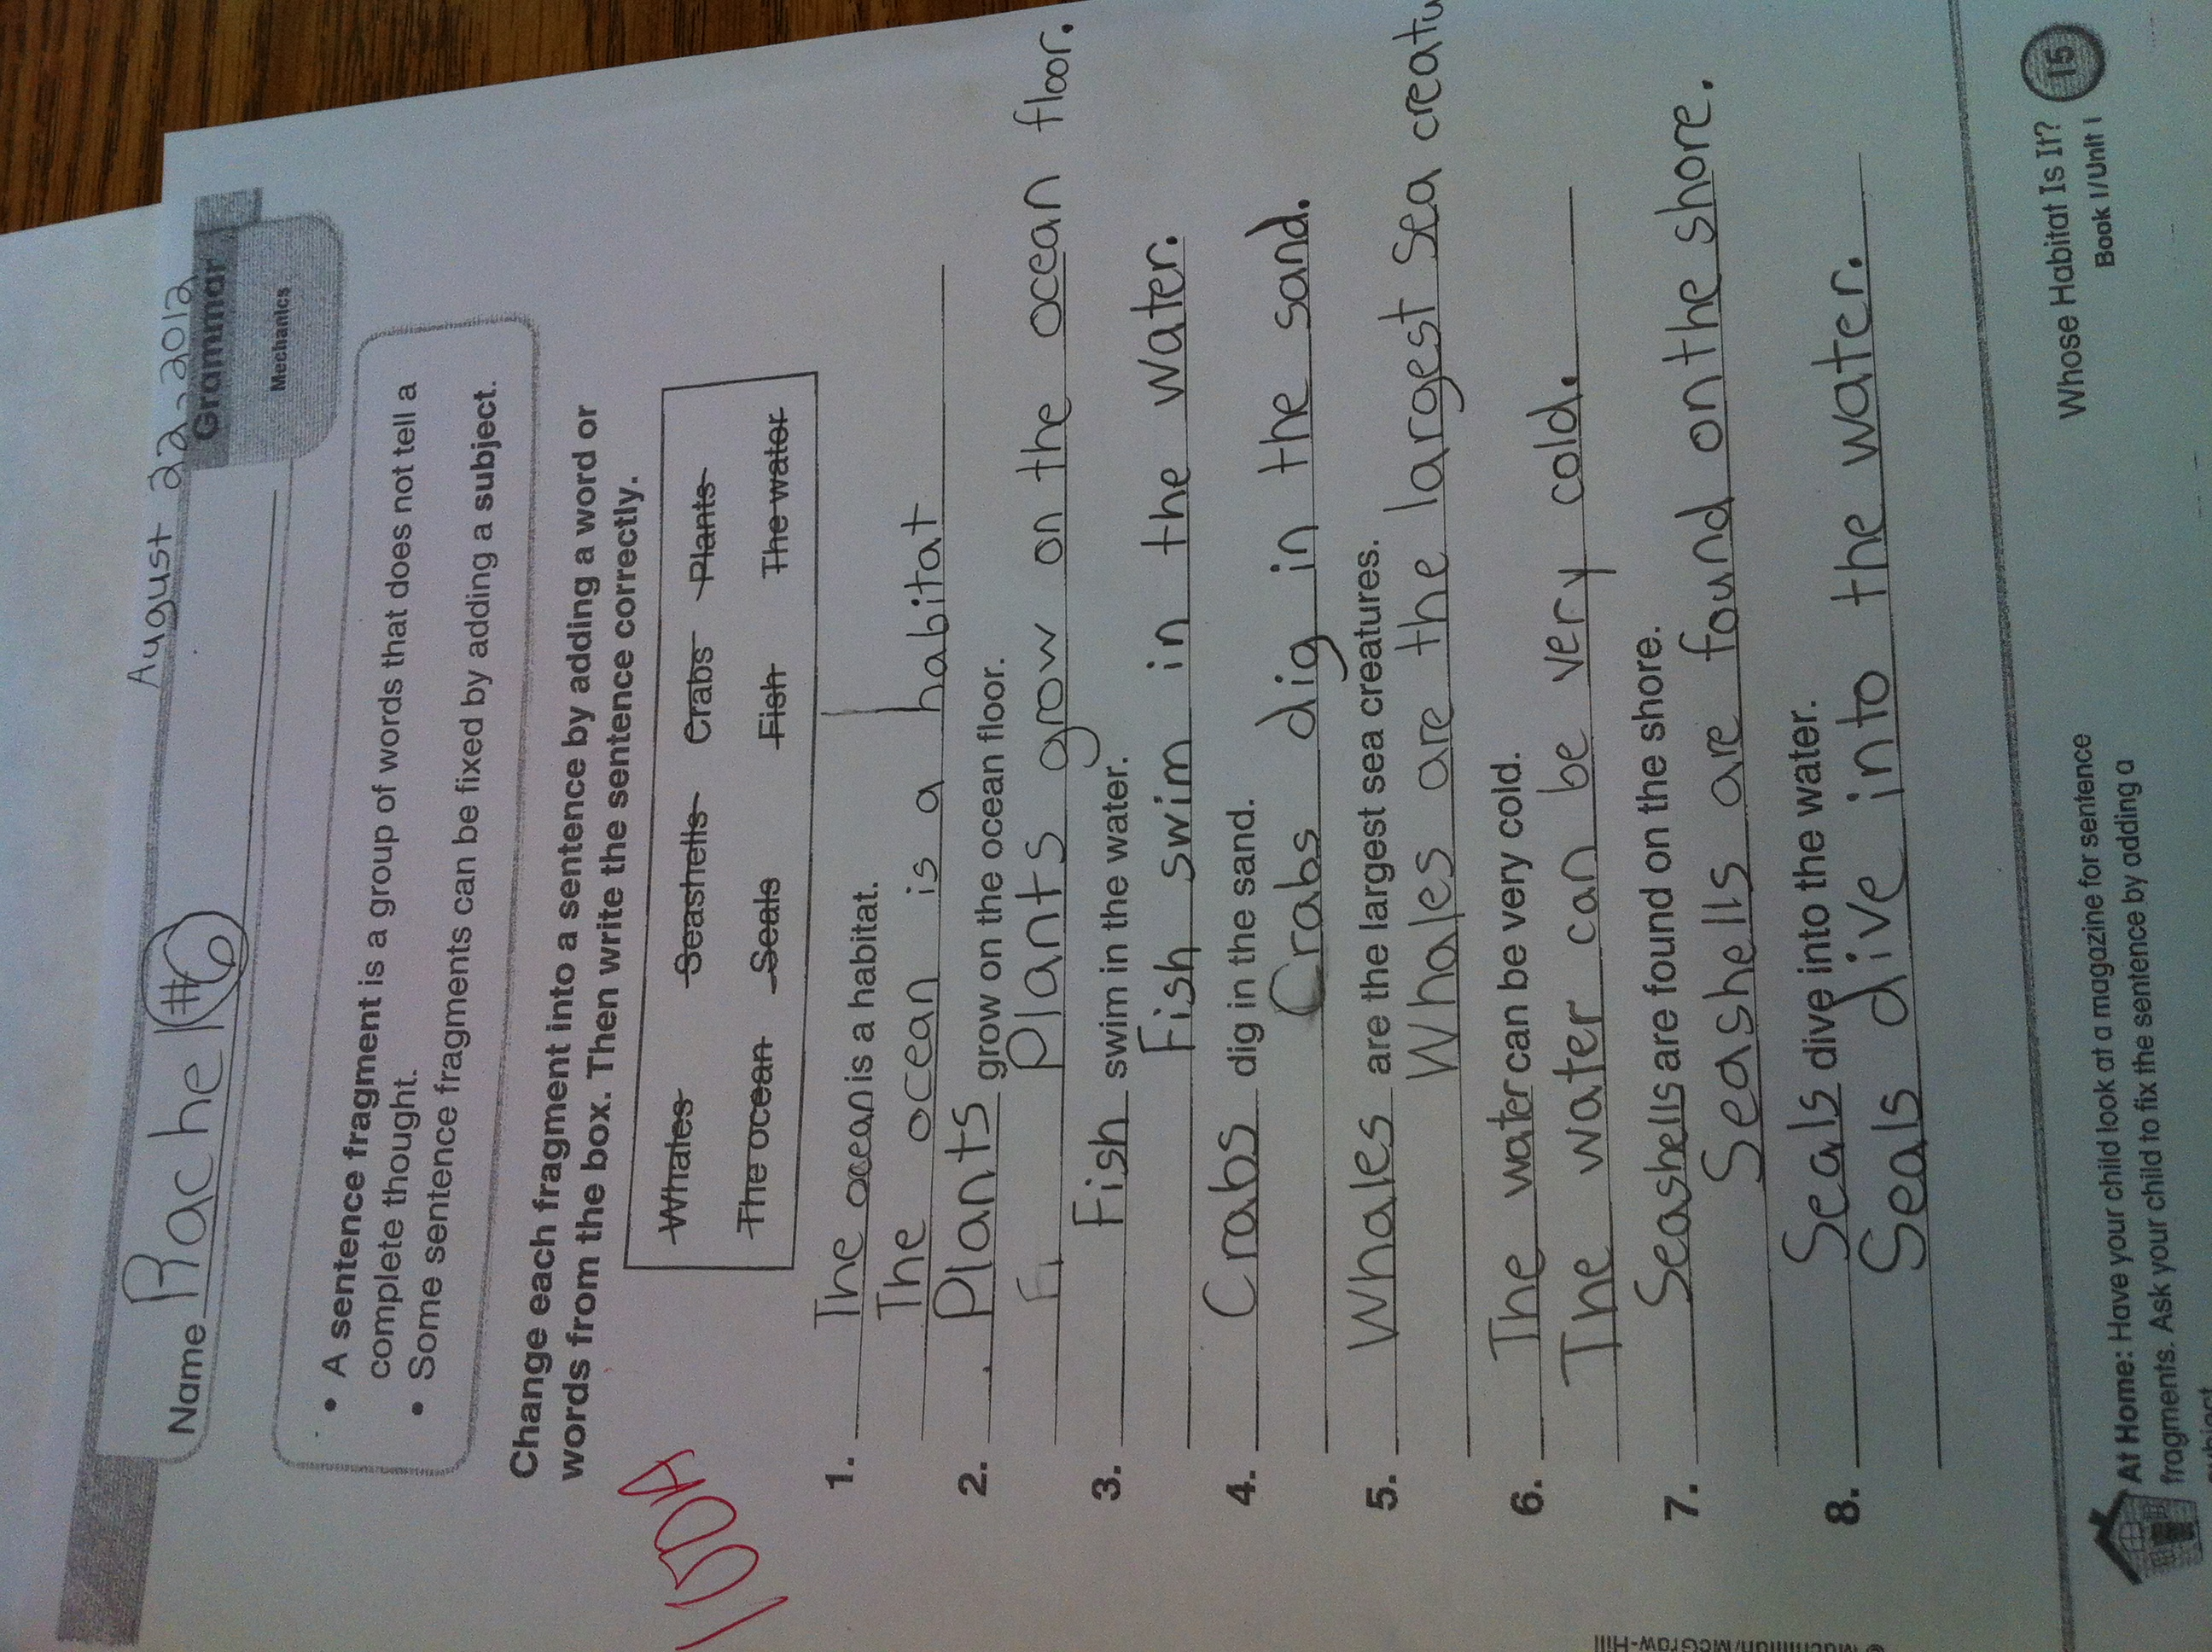 Sentence Fragment Worksheet Explore Wesley Fryer S Photos Flickr